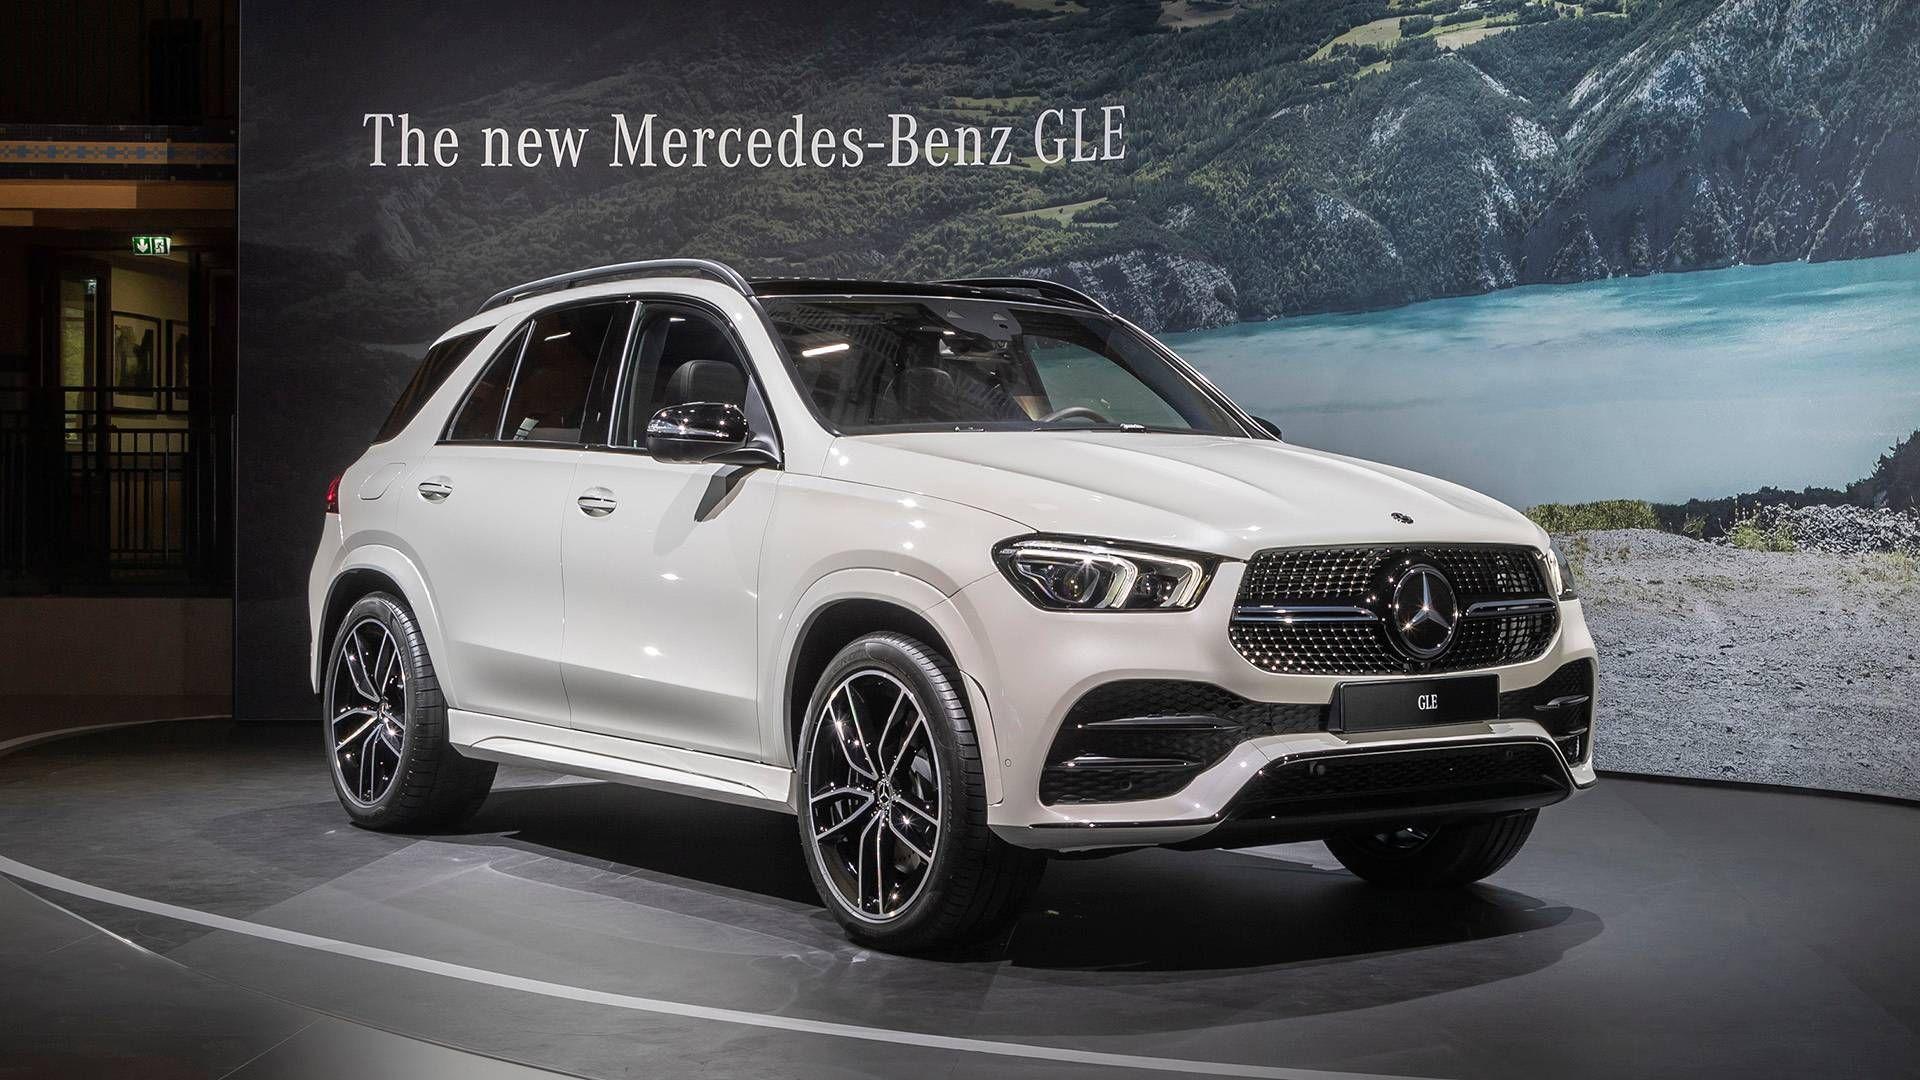 2018 Mercedes Benz Gle Interior Mercedes Benz Gle Mercedes Benz